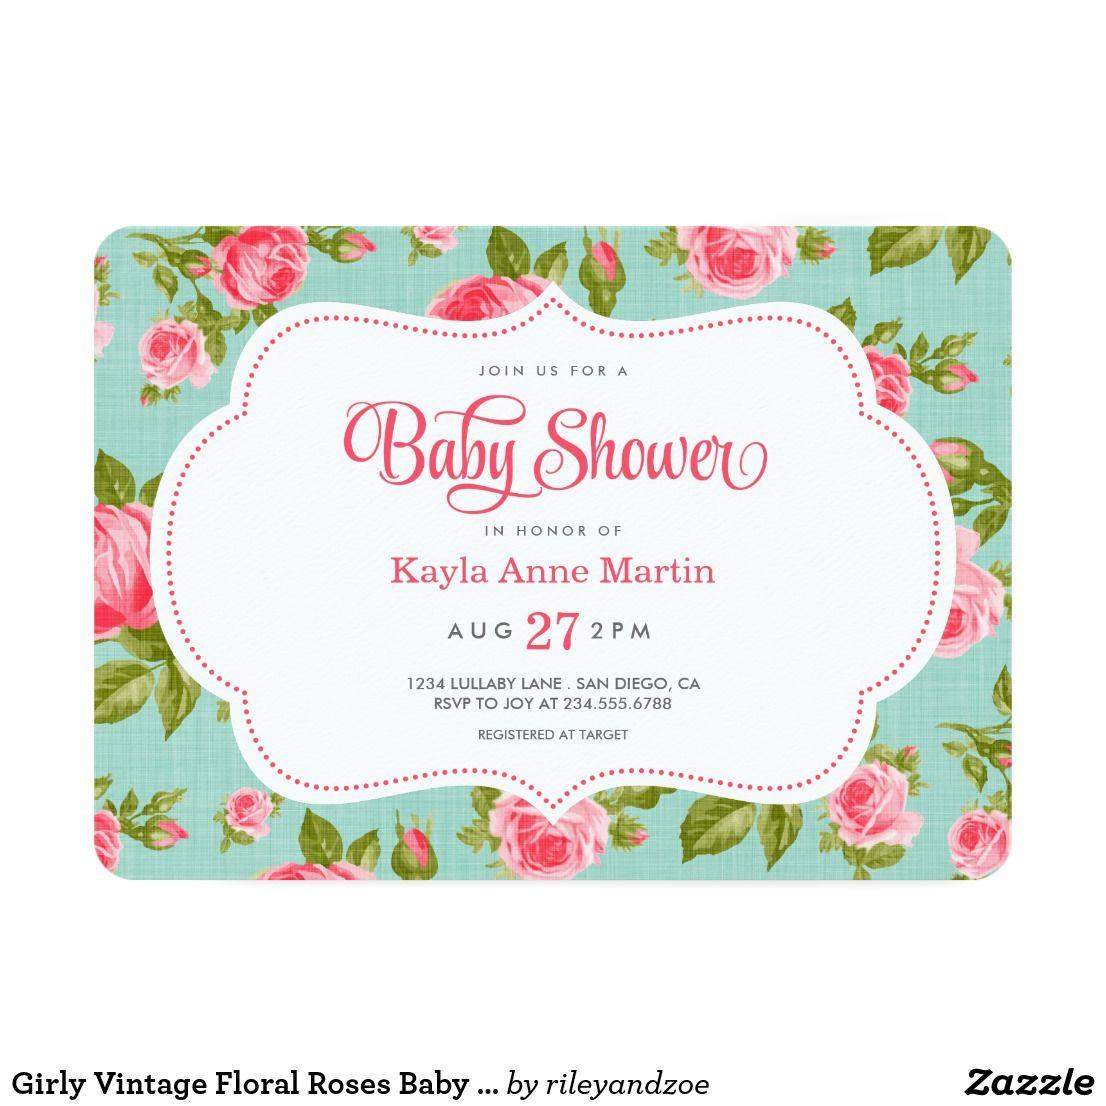 Girly Vintage Floral Roses Baby Shower Invitation | Shower invitations